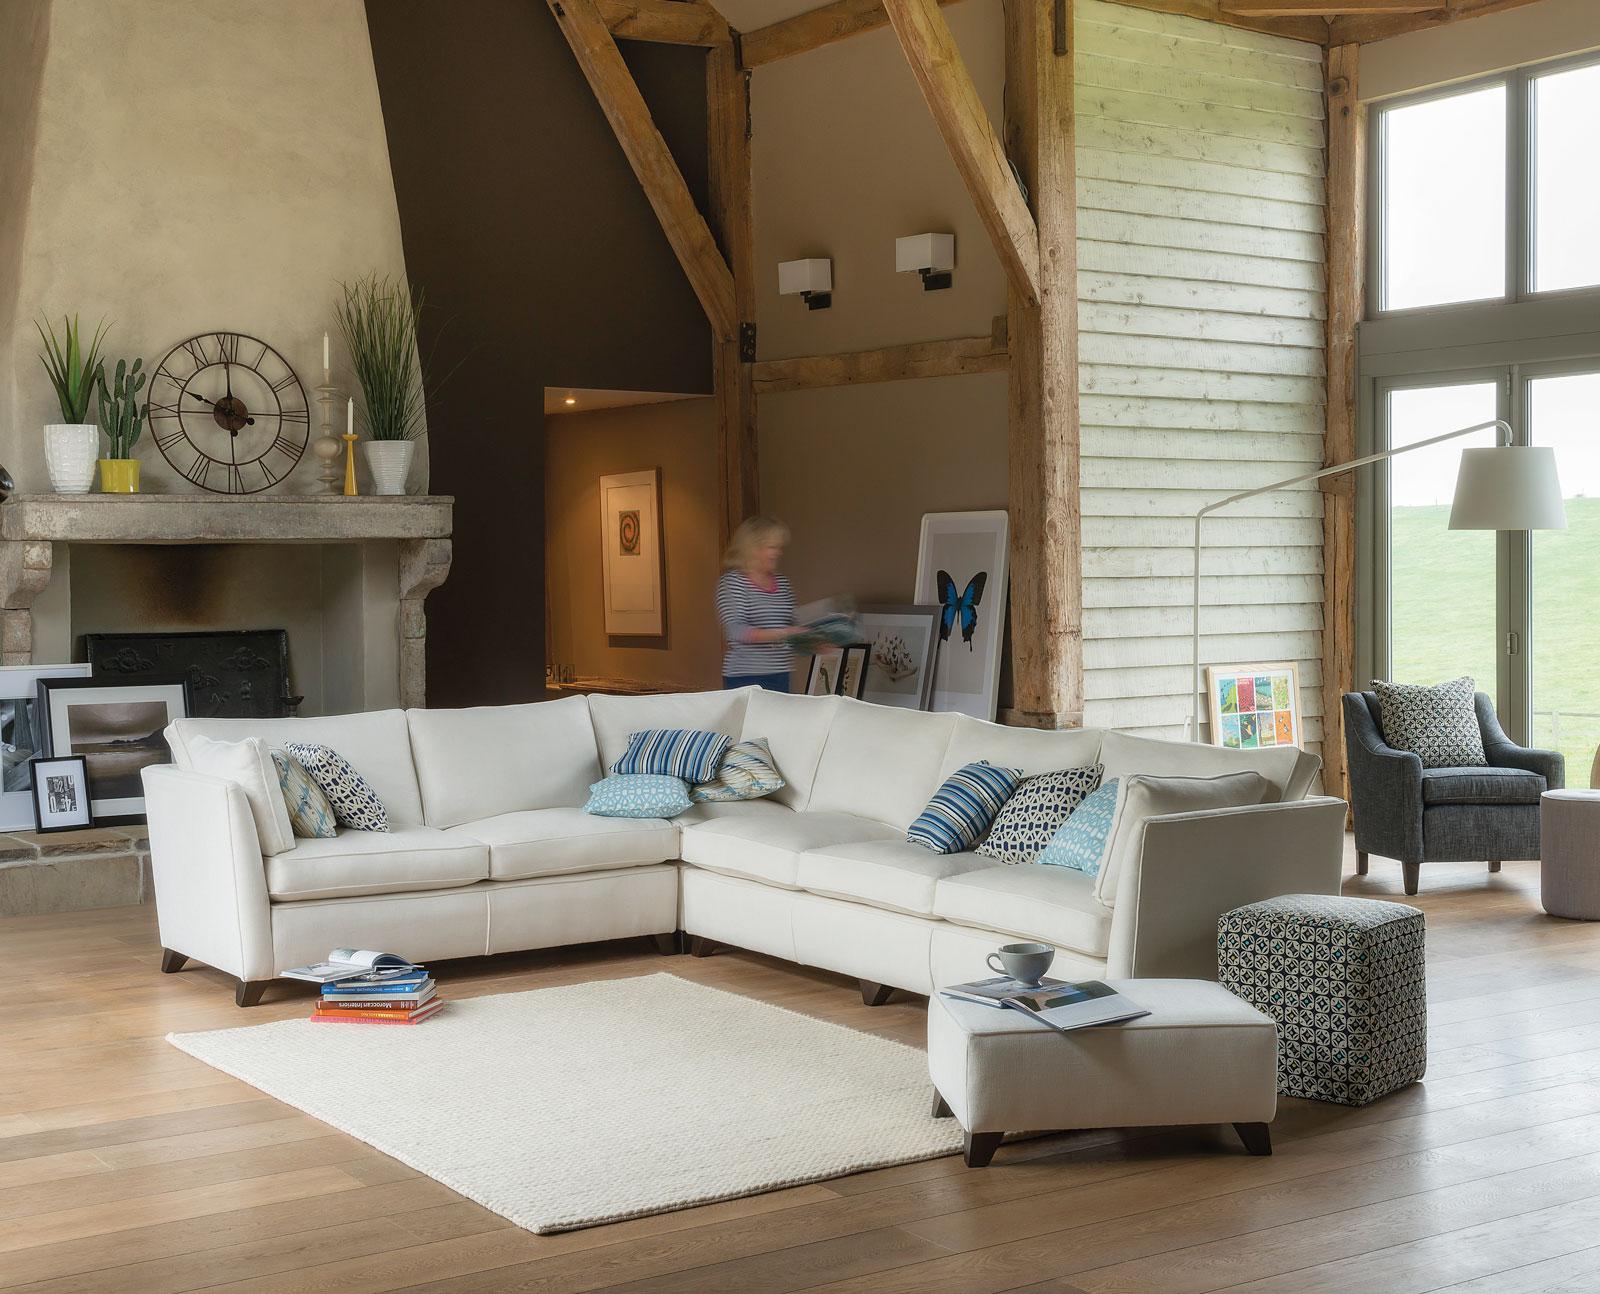 Whitehead-Designs-1600px-72dpi.jpg